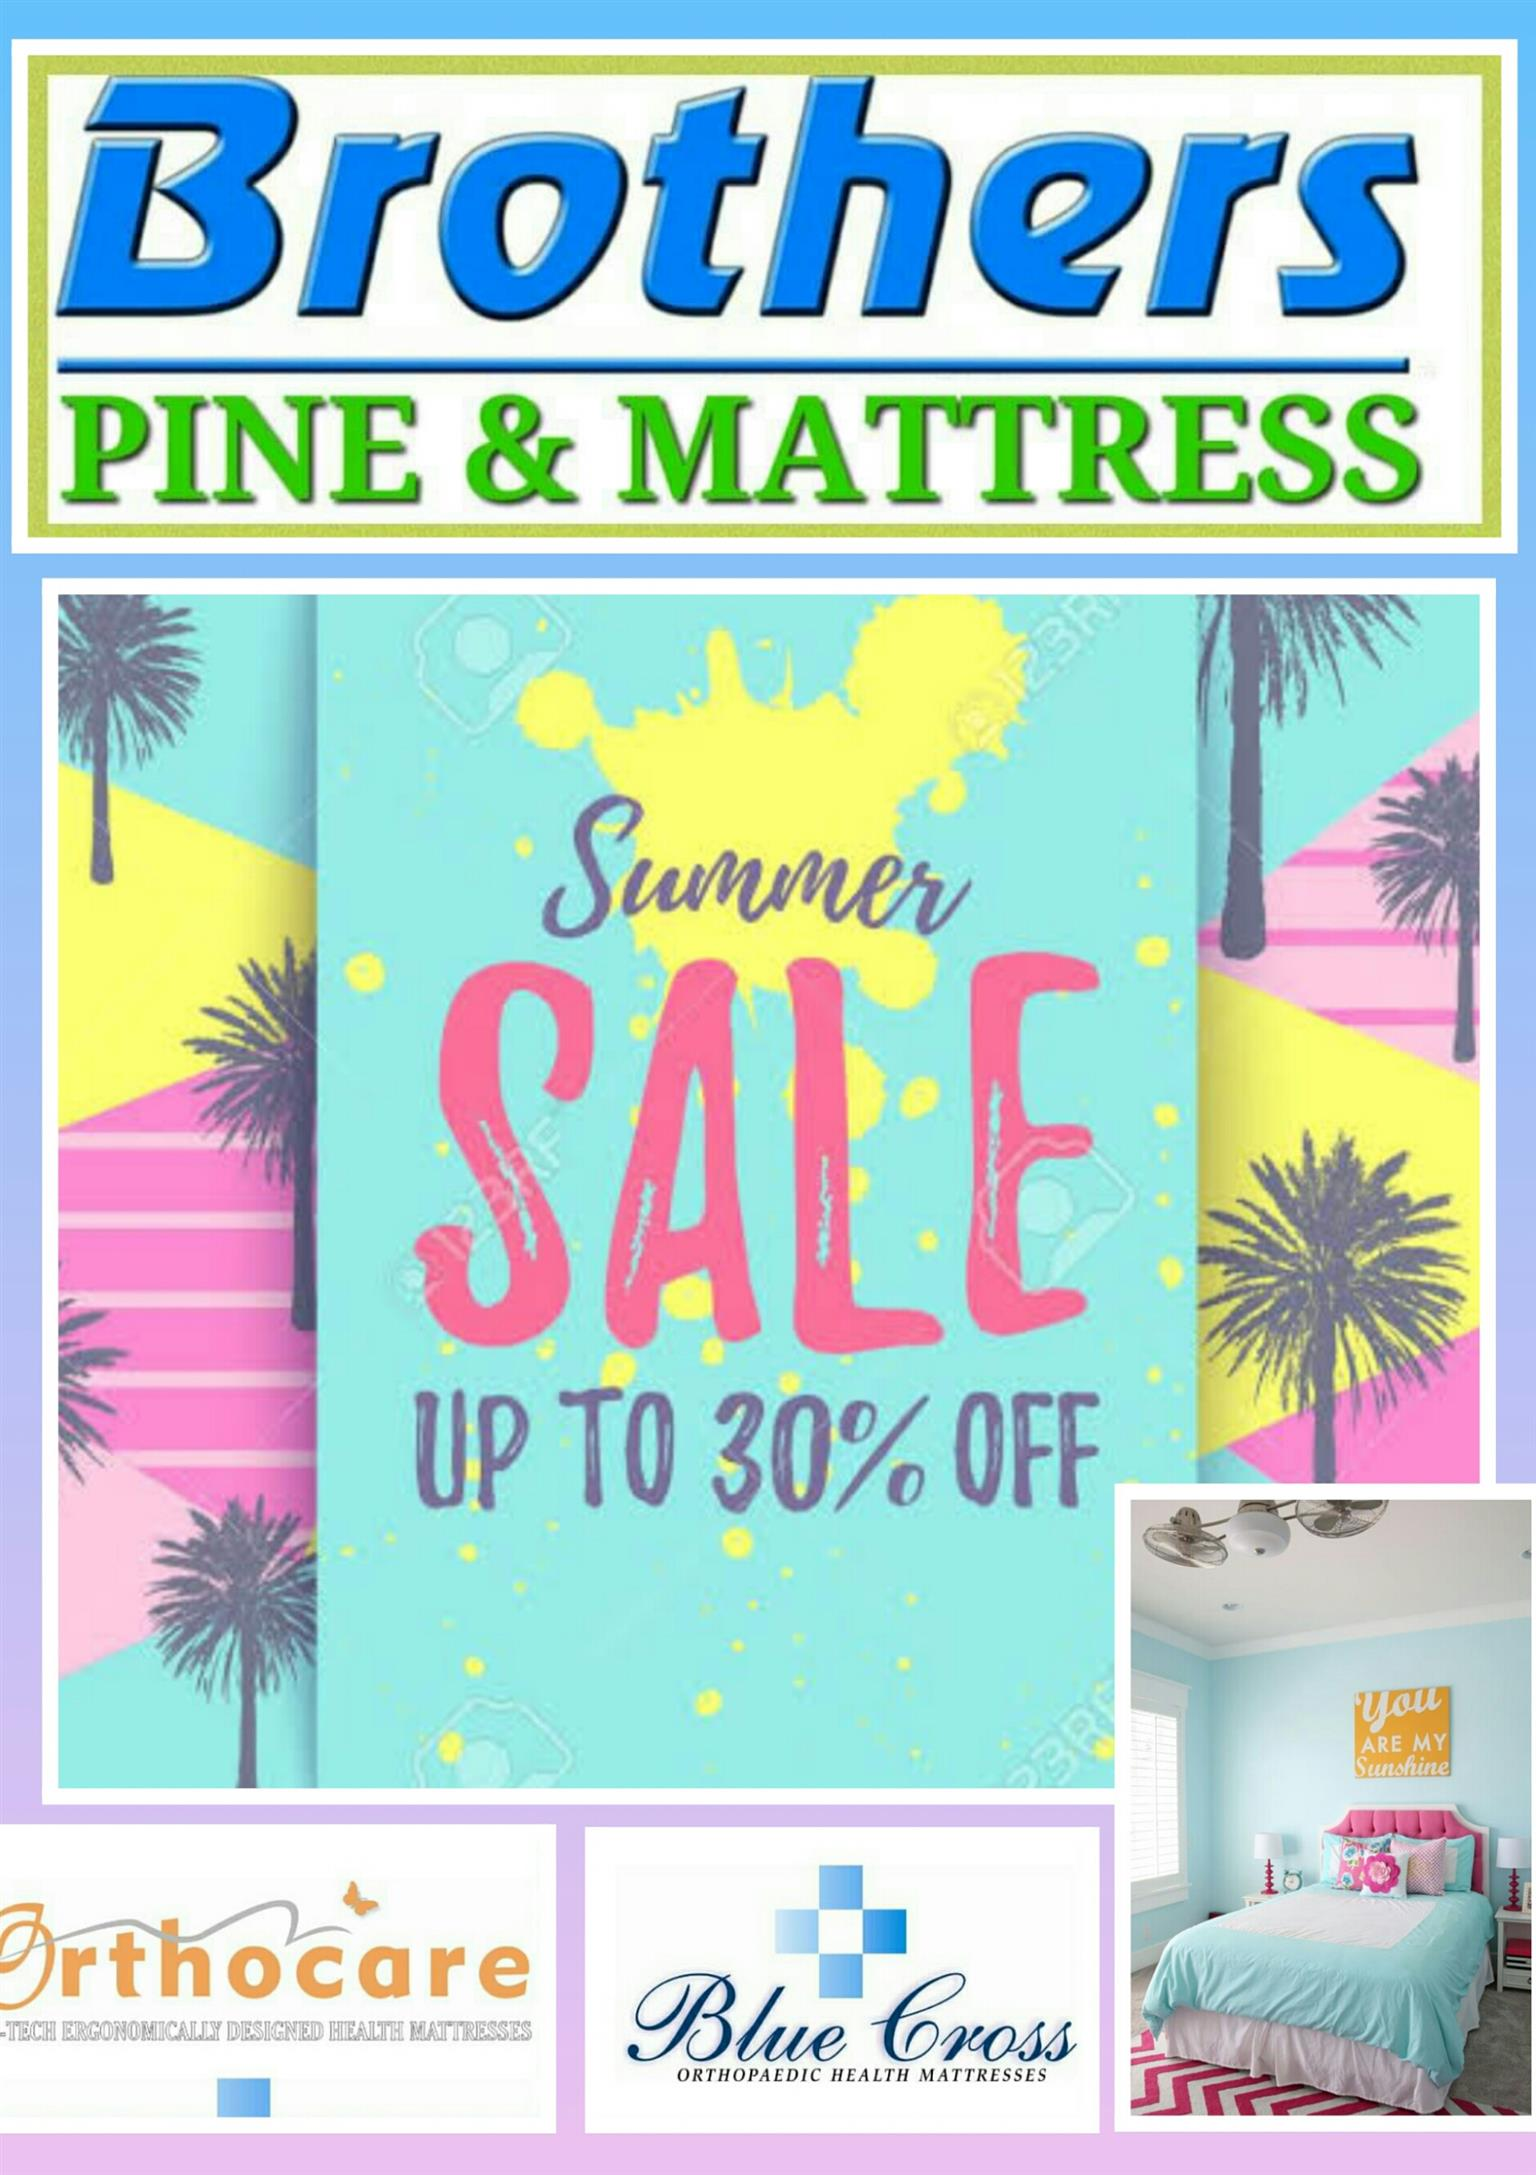 Brothers Pine & Mattress